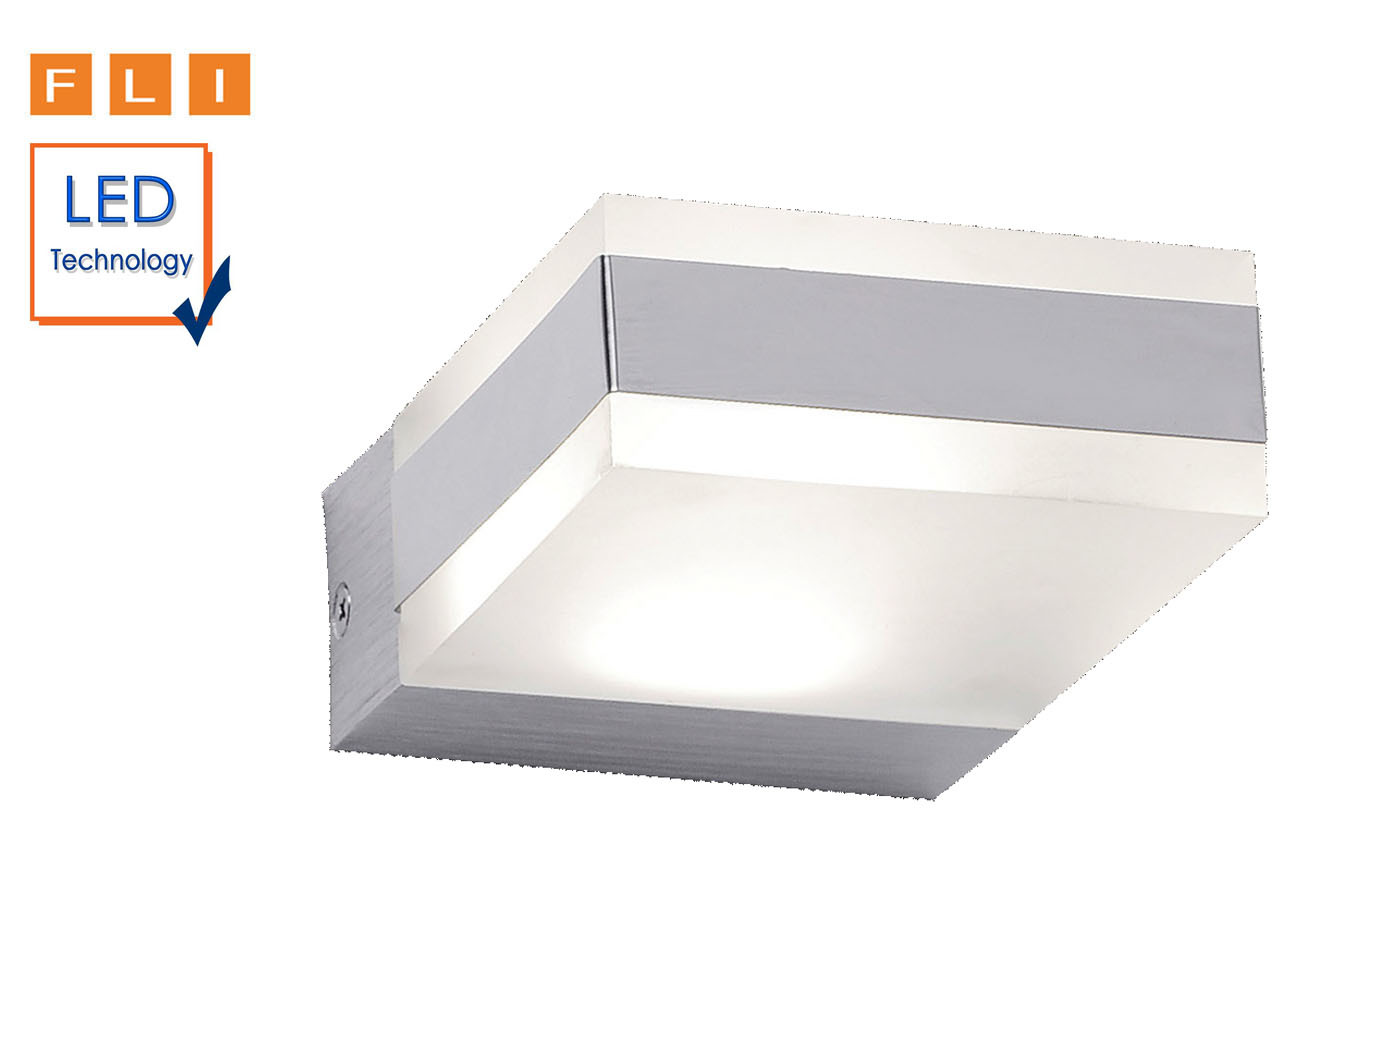 Eckige Led Design Wandlampe Fli Wohnzimmerlampe Flurlampe Indirekte